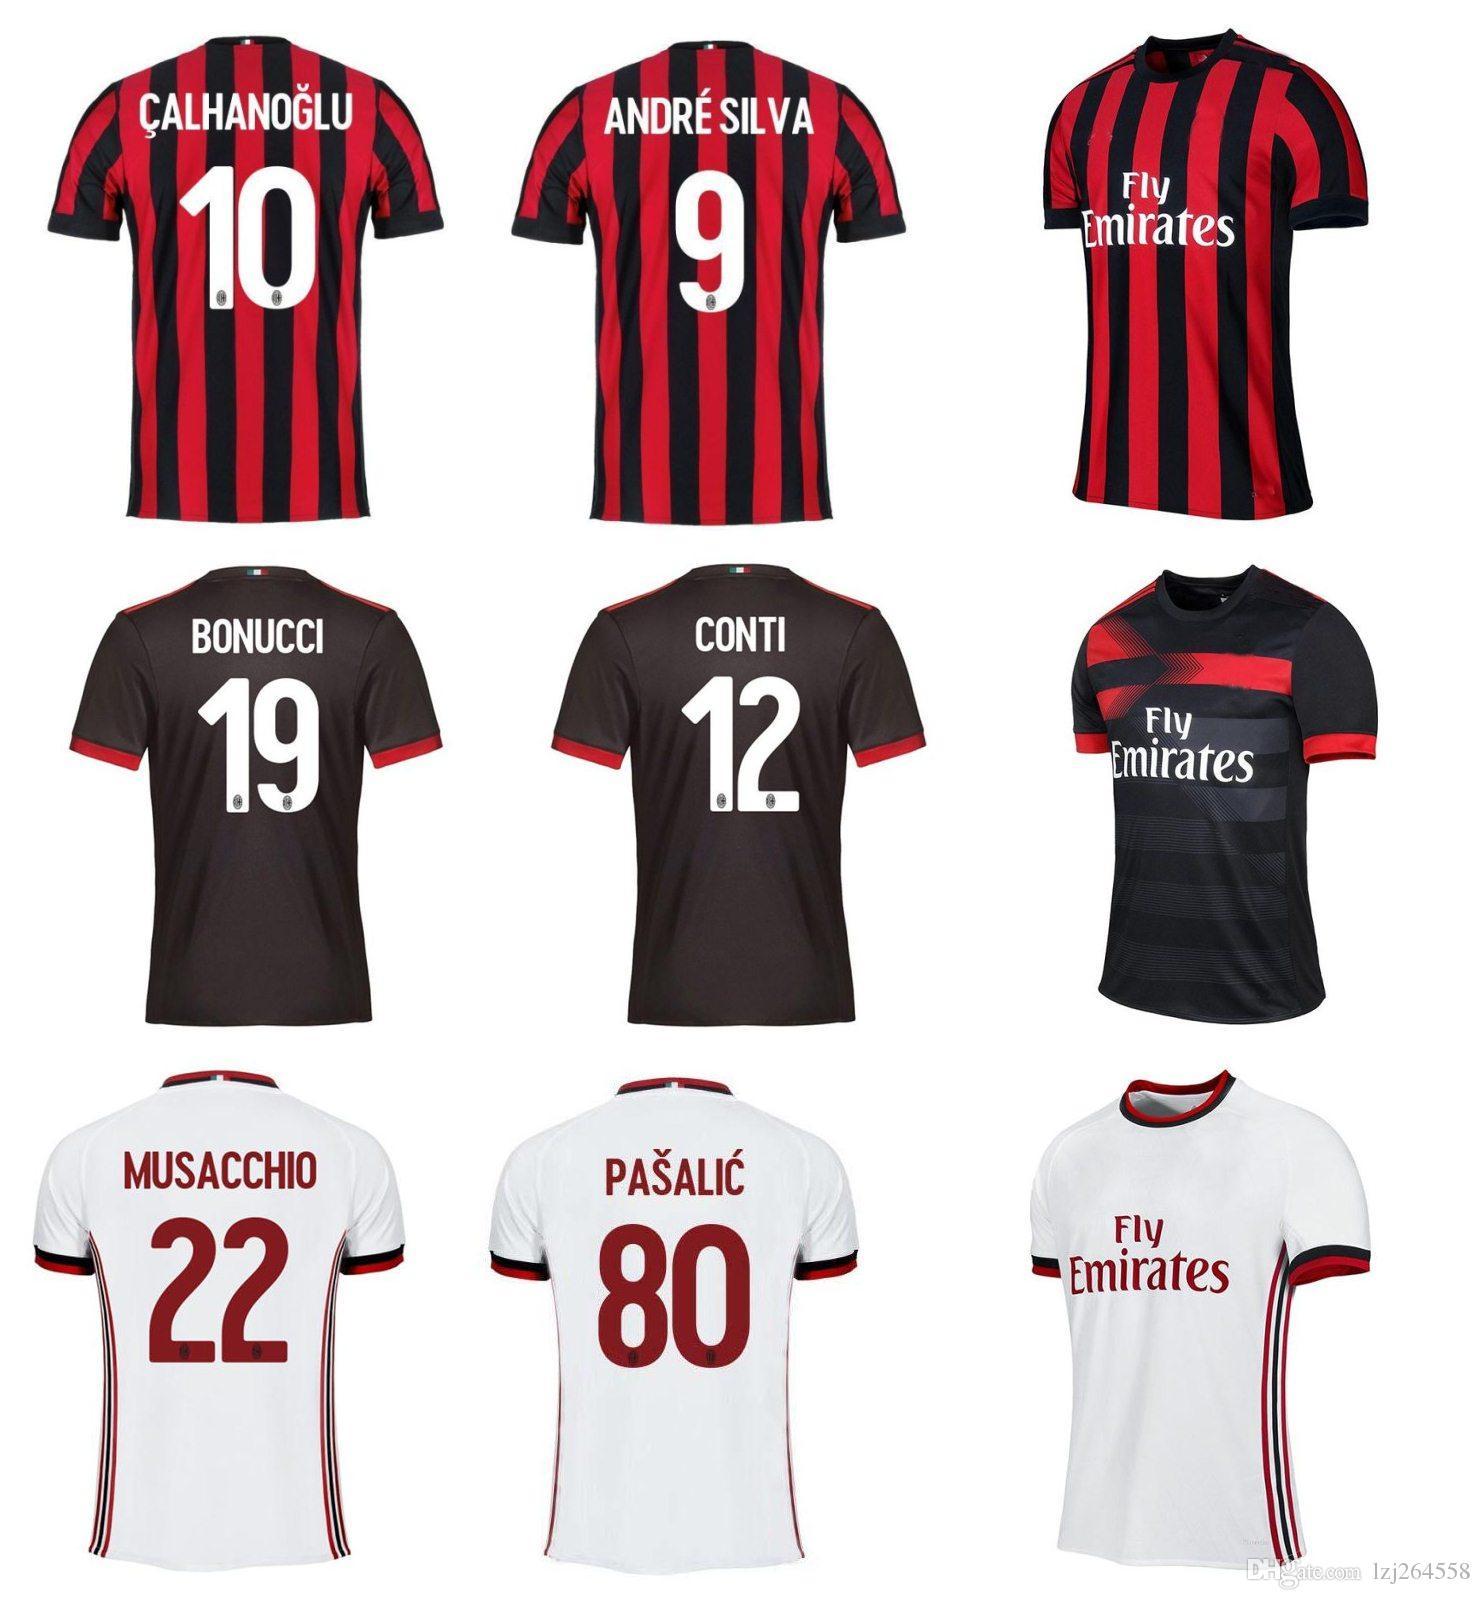 Whosales Ac Milan Camiseta De Fútbol 2018 Camisetas De Fútbol Uniforme 2017  Borini Andre Silva Bonucci R.Rodrigues Calhanoglu Suso Romagnoli 17 18 Top  Por ...